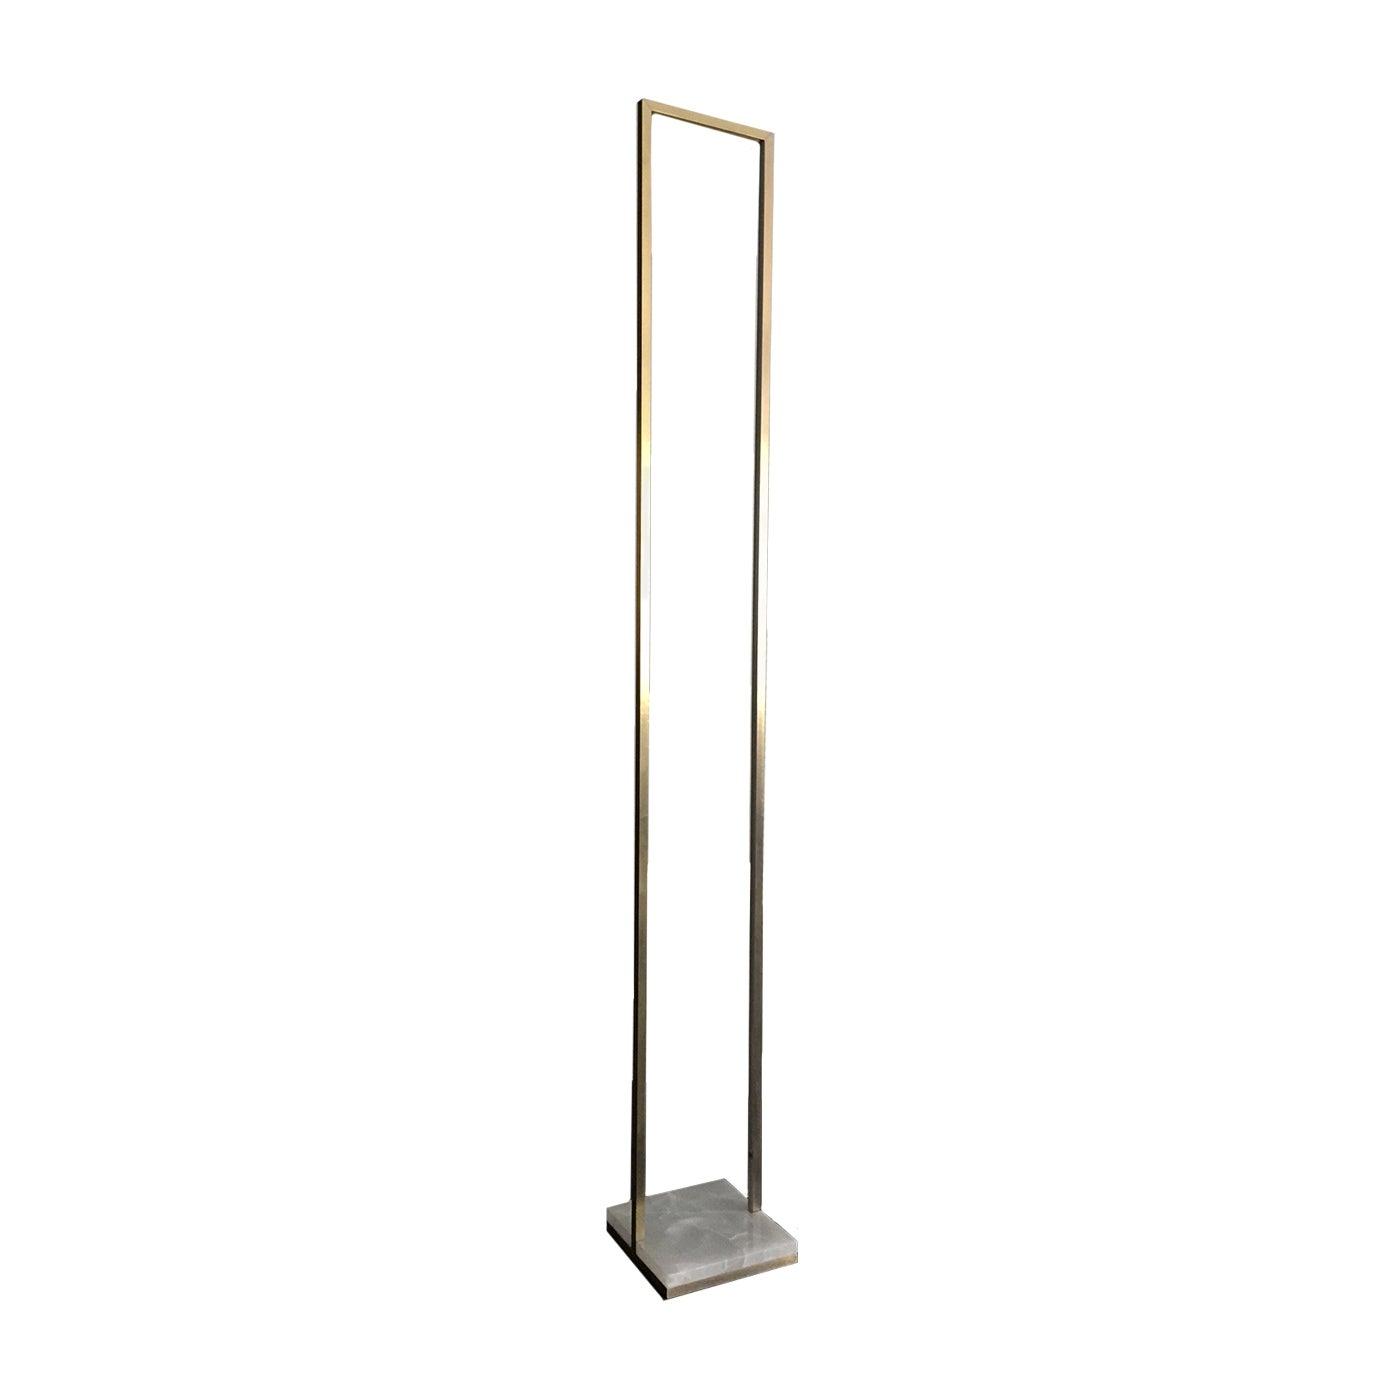 Floorframe Floor Lamp in Carrara Marble and Brass